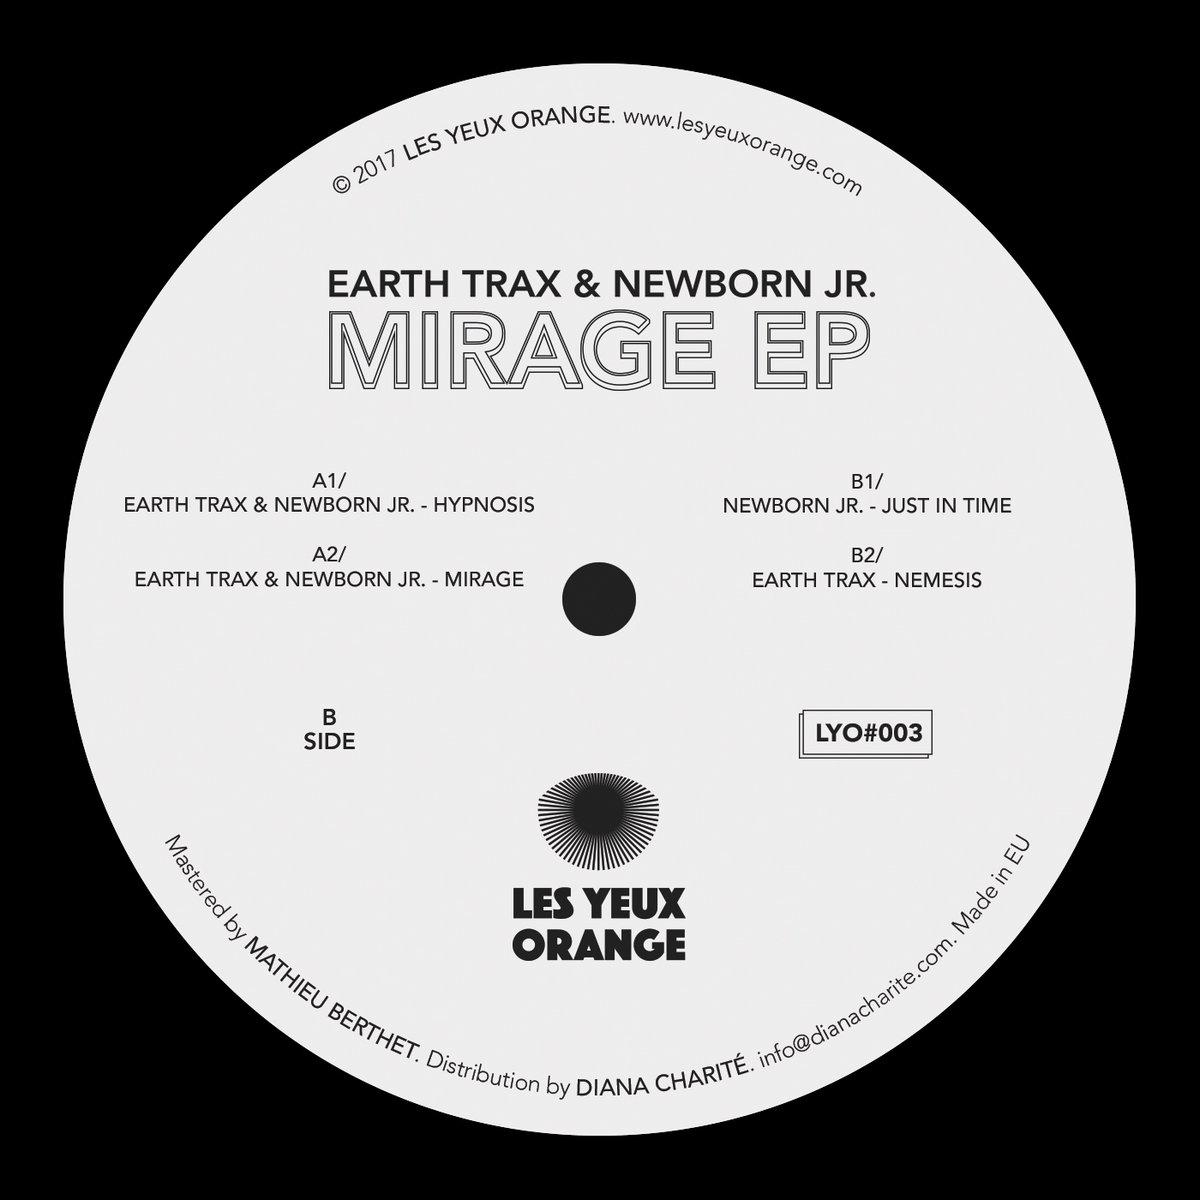 LYO003 - Earth Trax & Newborn Jr  - Mirage EP | Les Yeux Orange